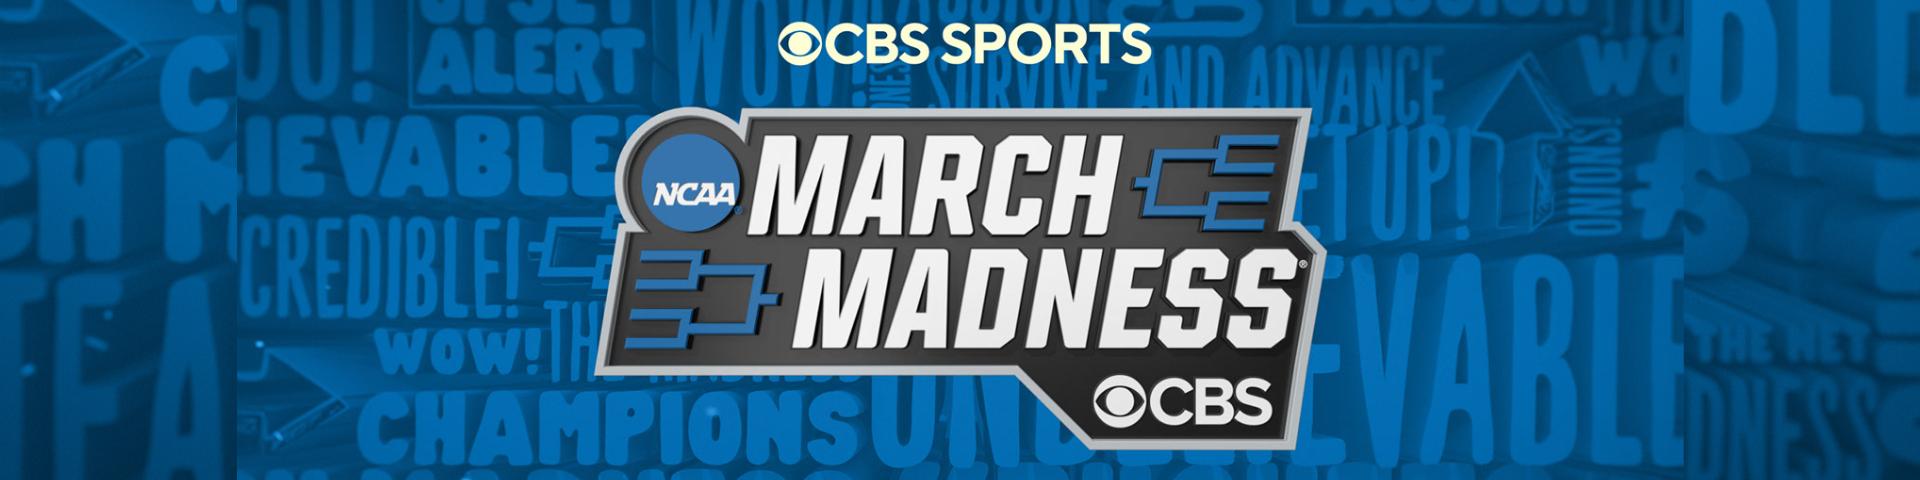 March Madness Cbs